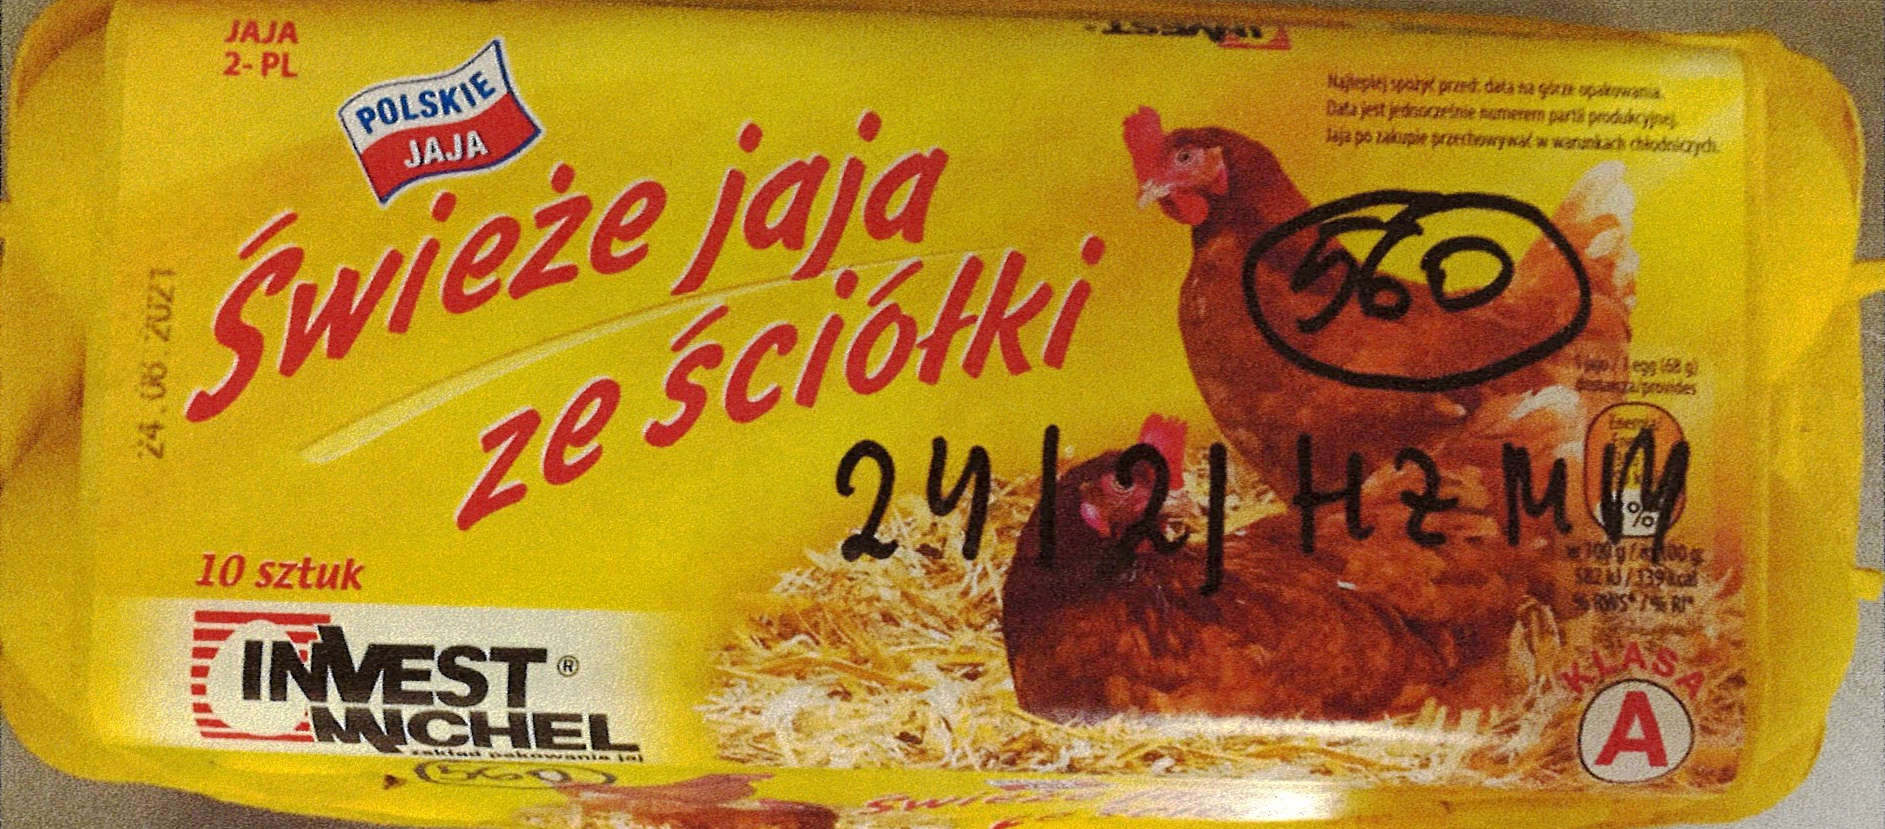 Jaja konsumpcyje skażone Salmonellą.